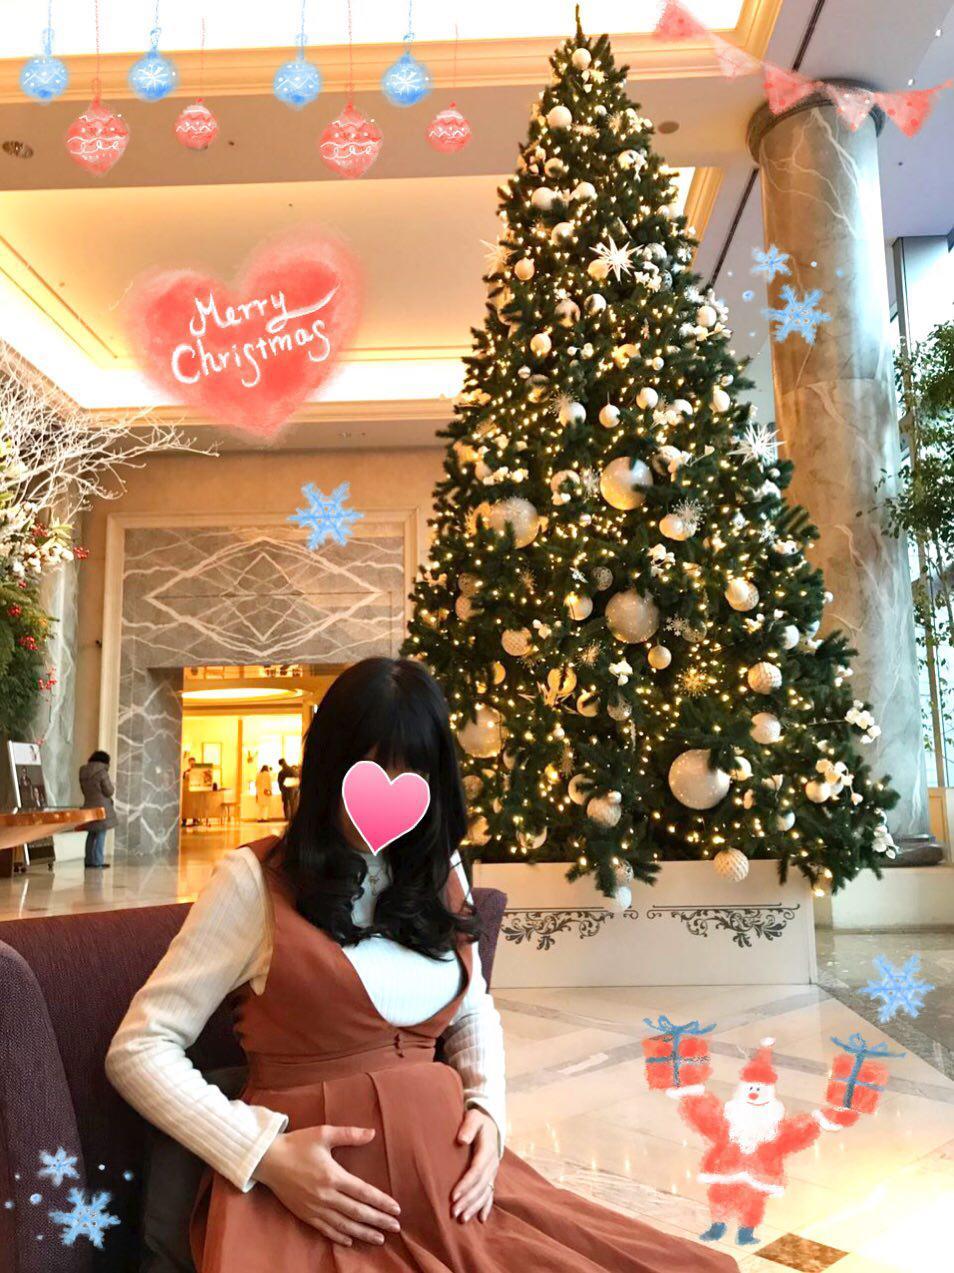 photo_2017-12-25_21-18-12.jpg